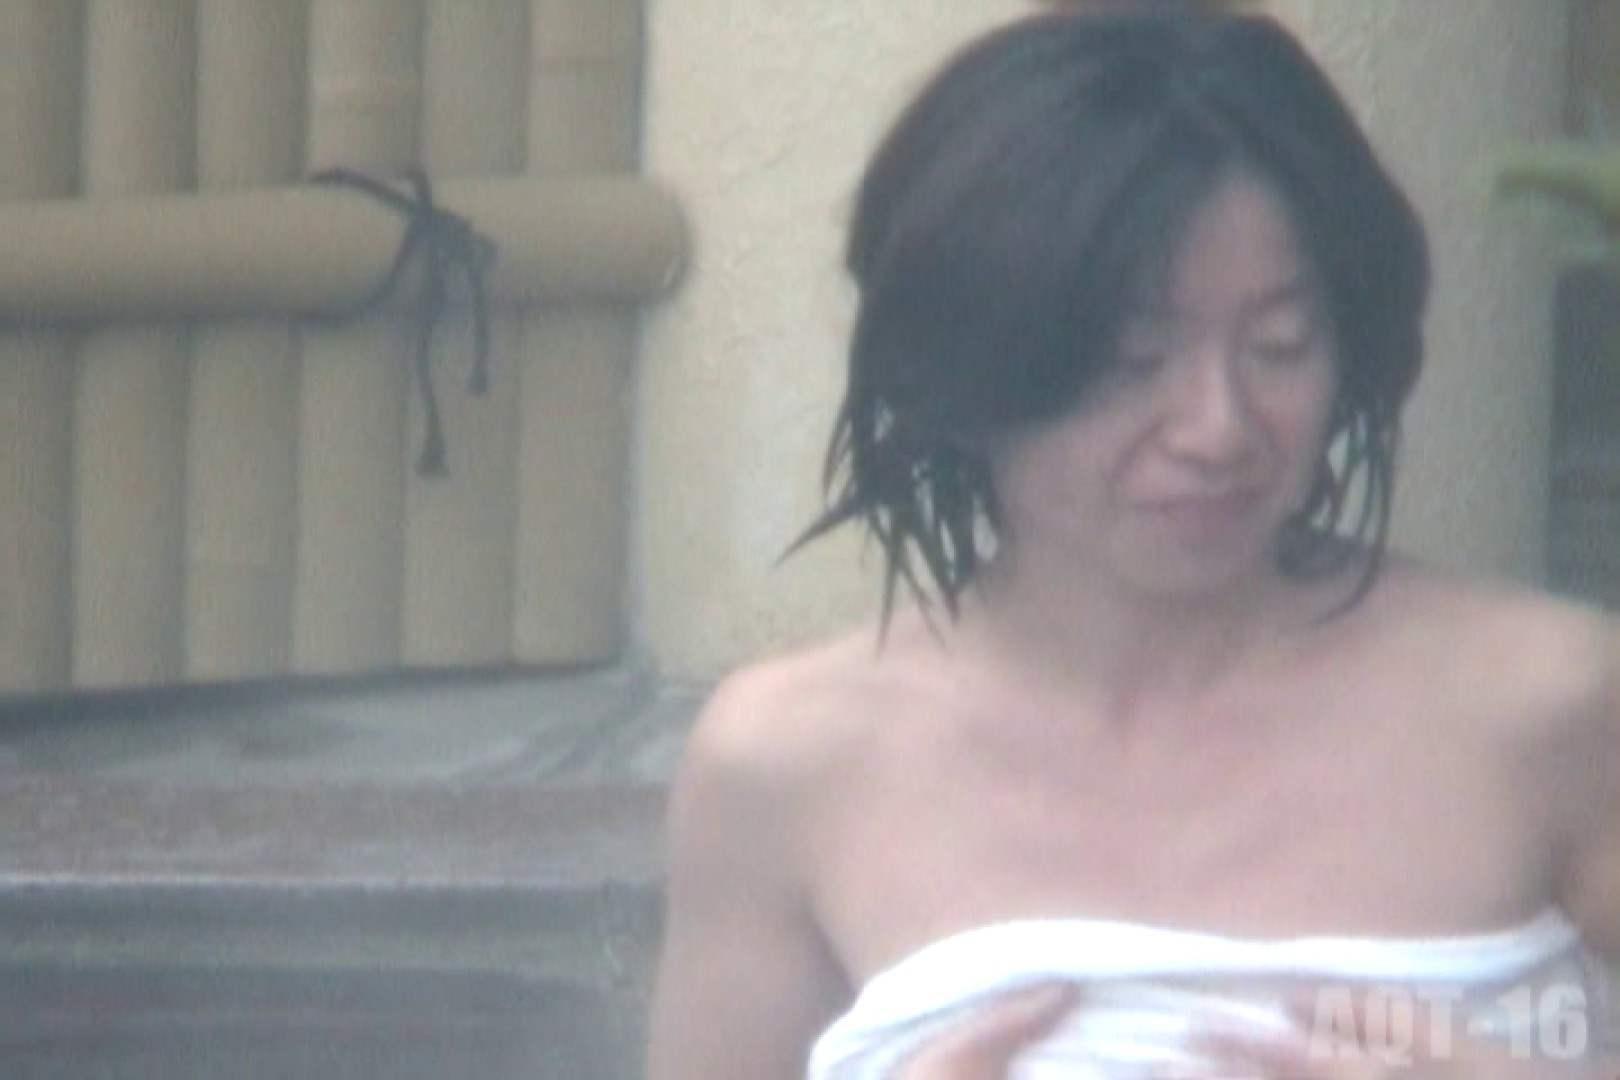 Aquaな露天風呂Vol.841 露天 のぞき動画キャプチャ 86pic 19